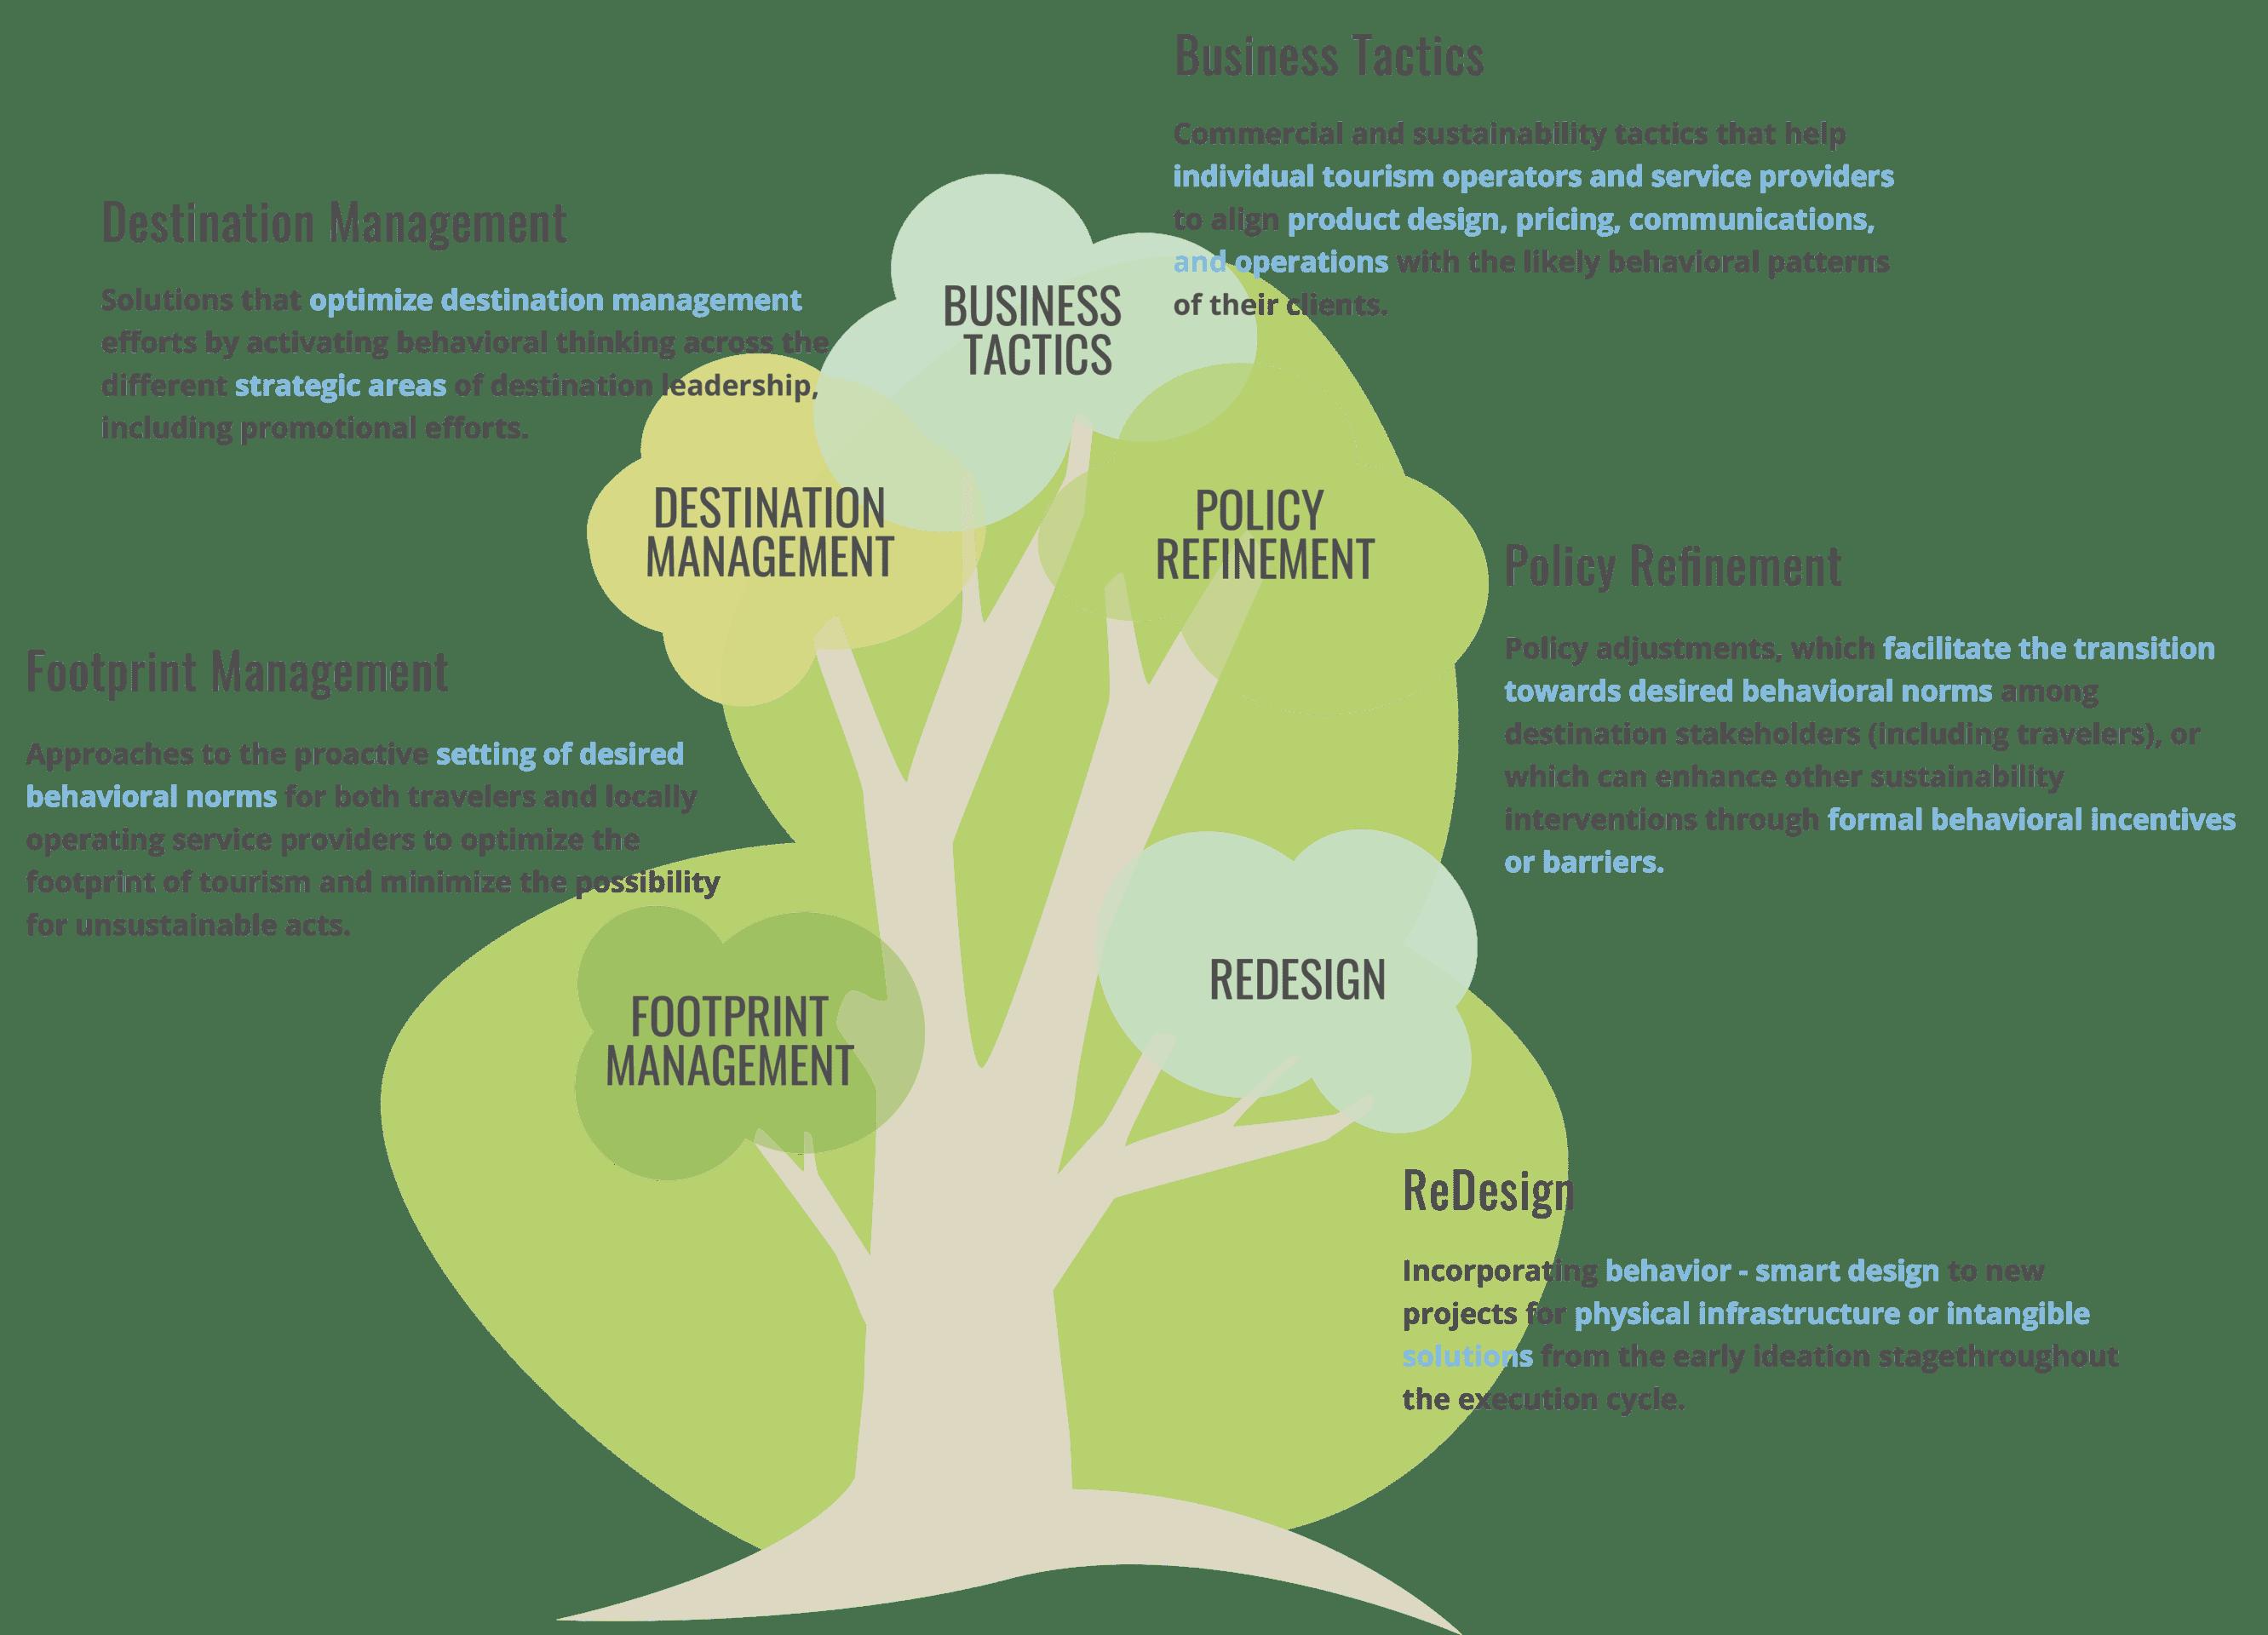 BehaviorSMART Services